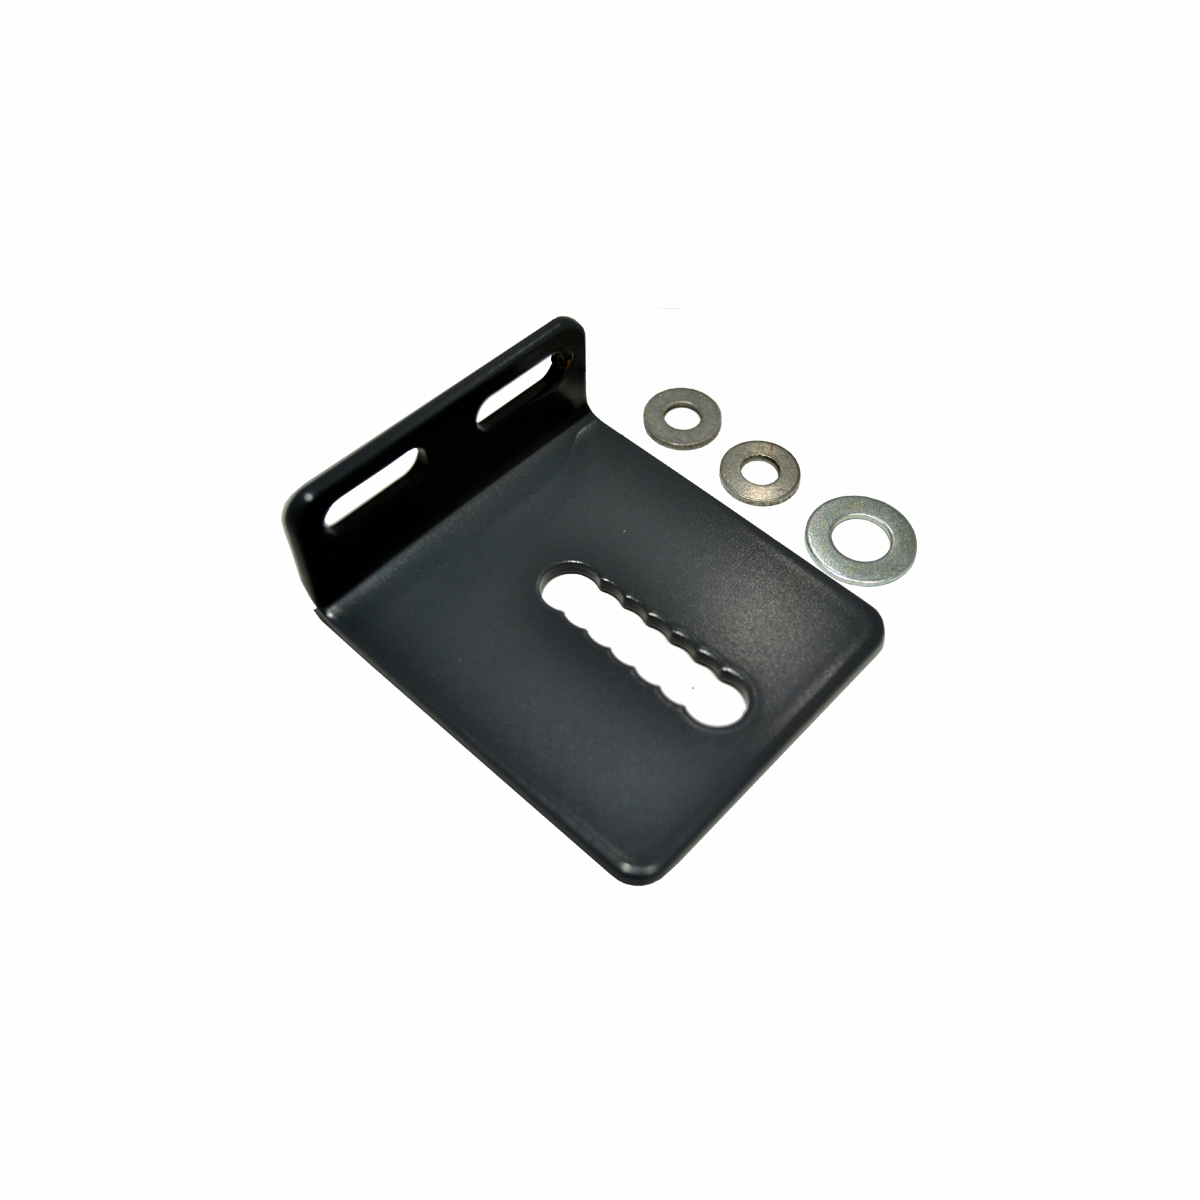 070-006-259 Adjustable Shuttle Bracket